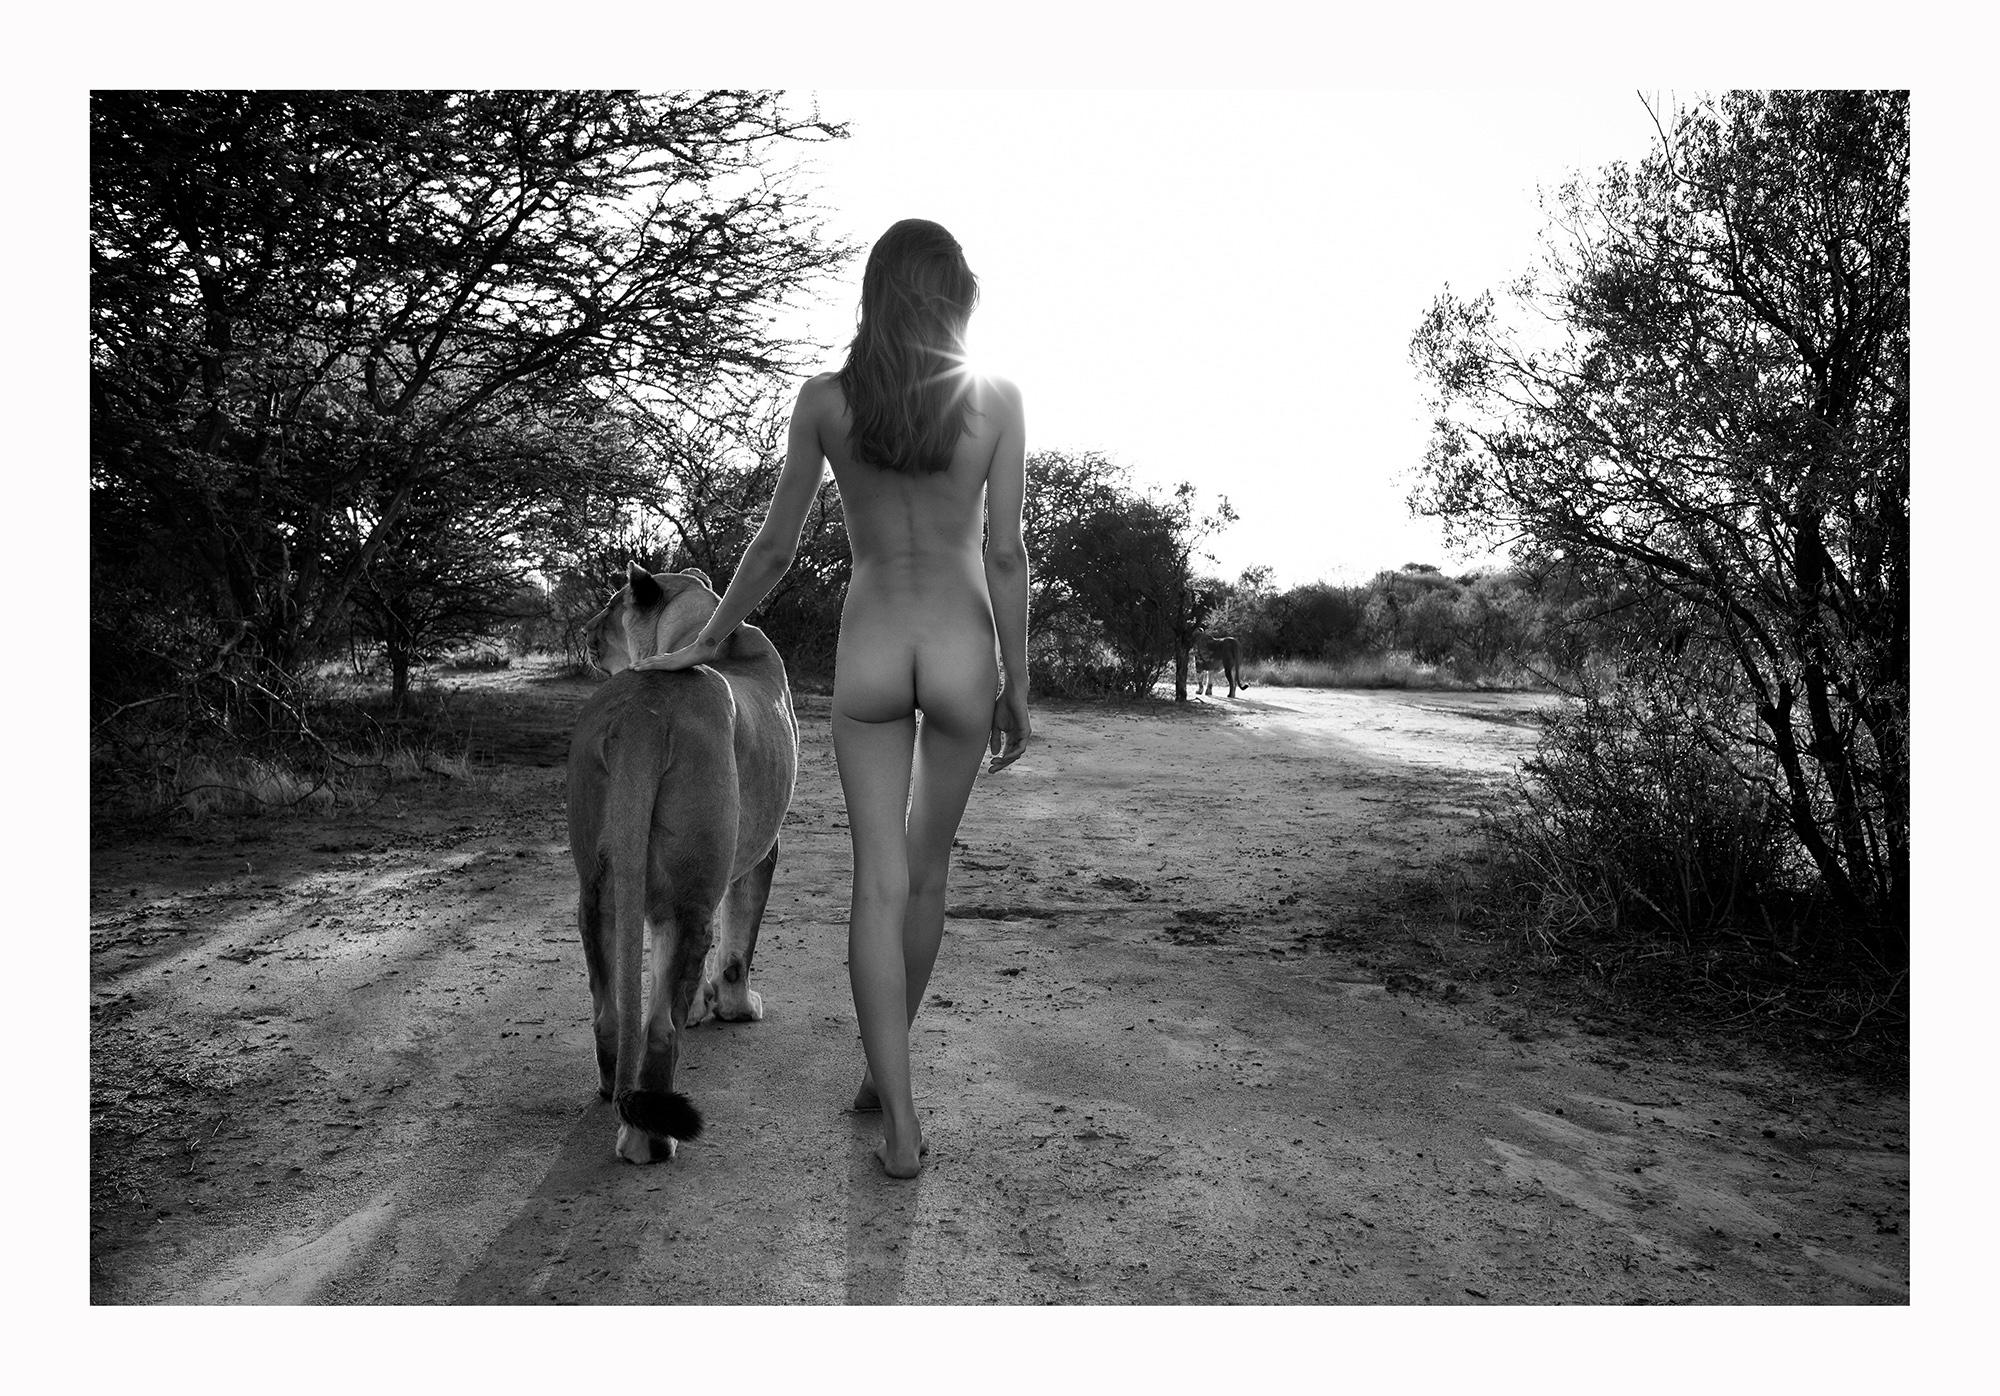 12 Natural Wonders in Afrika von Paul Giggle 4